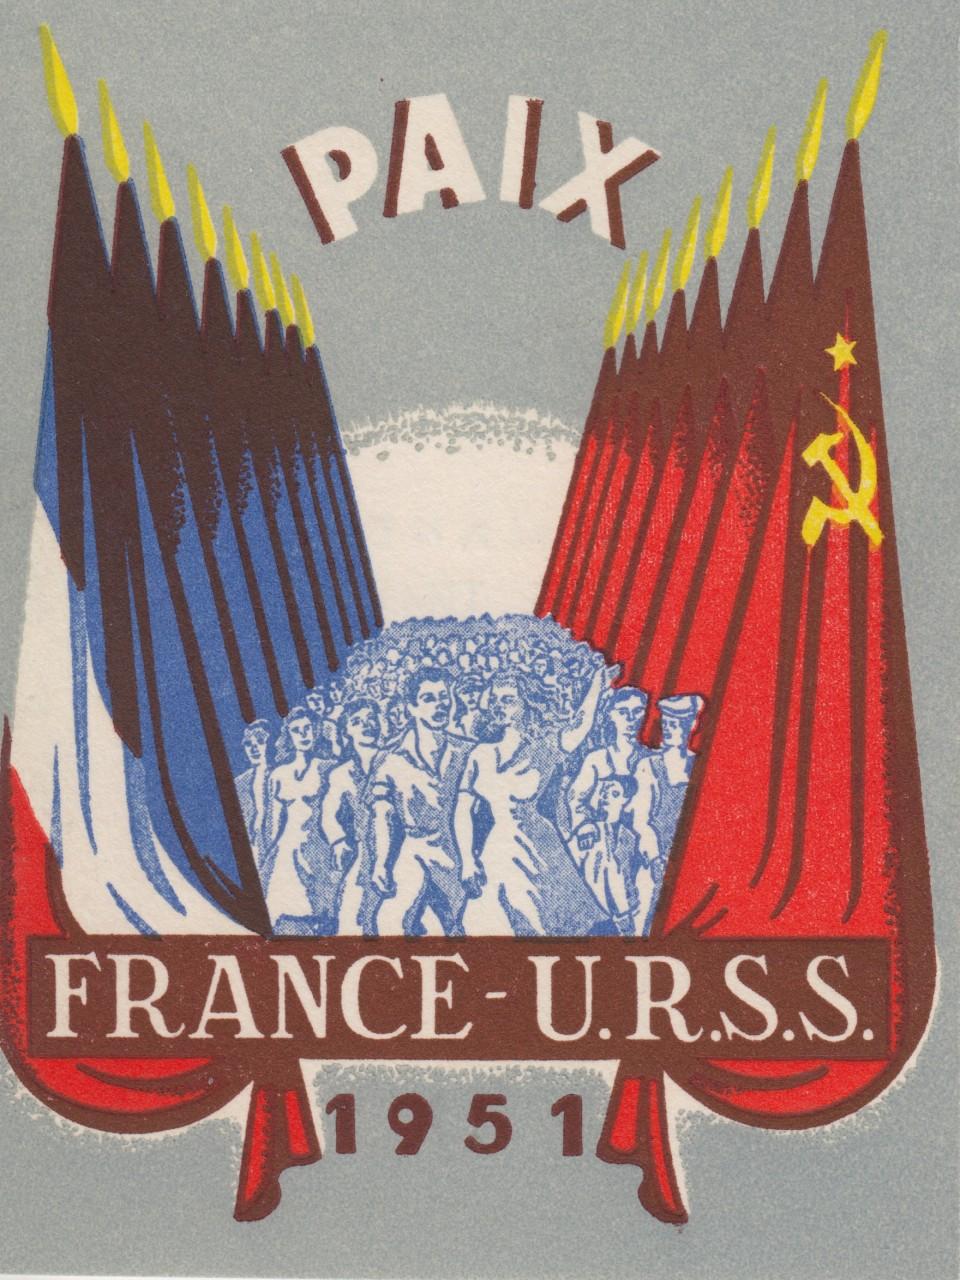 jarlaud-france-urss-1951ter